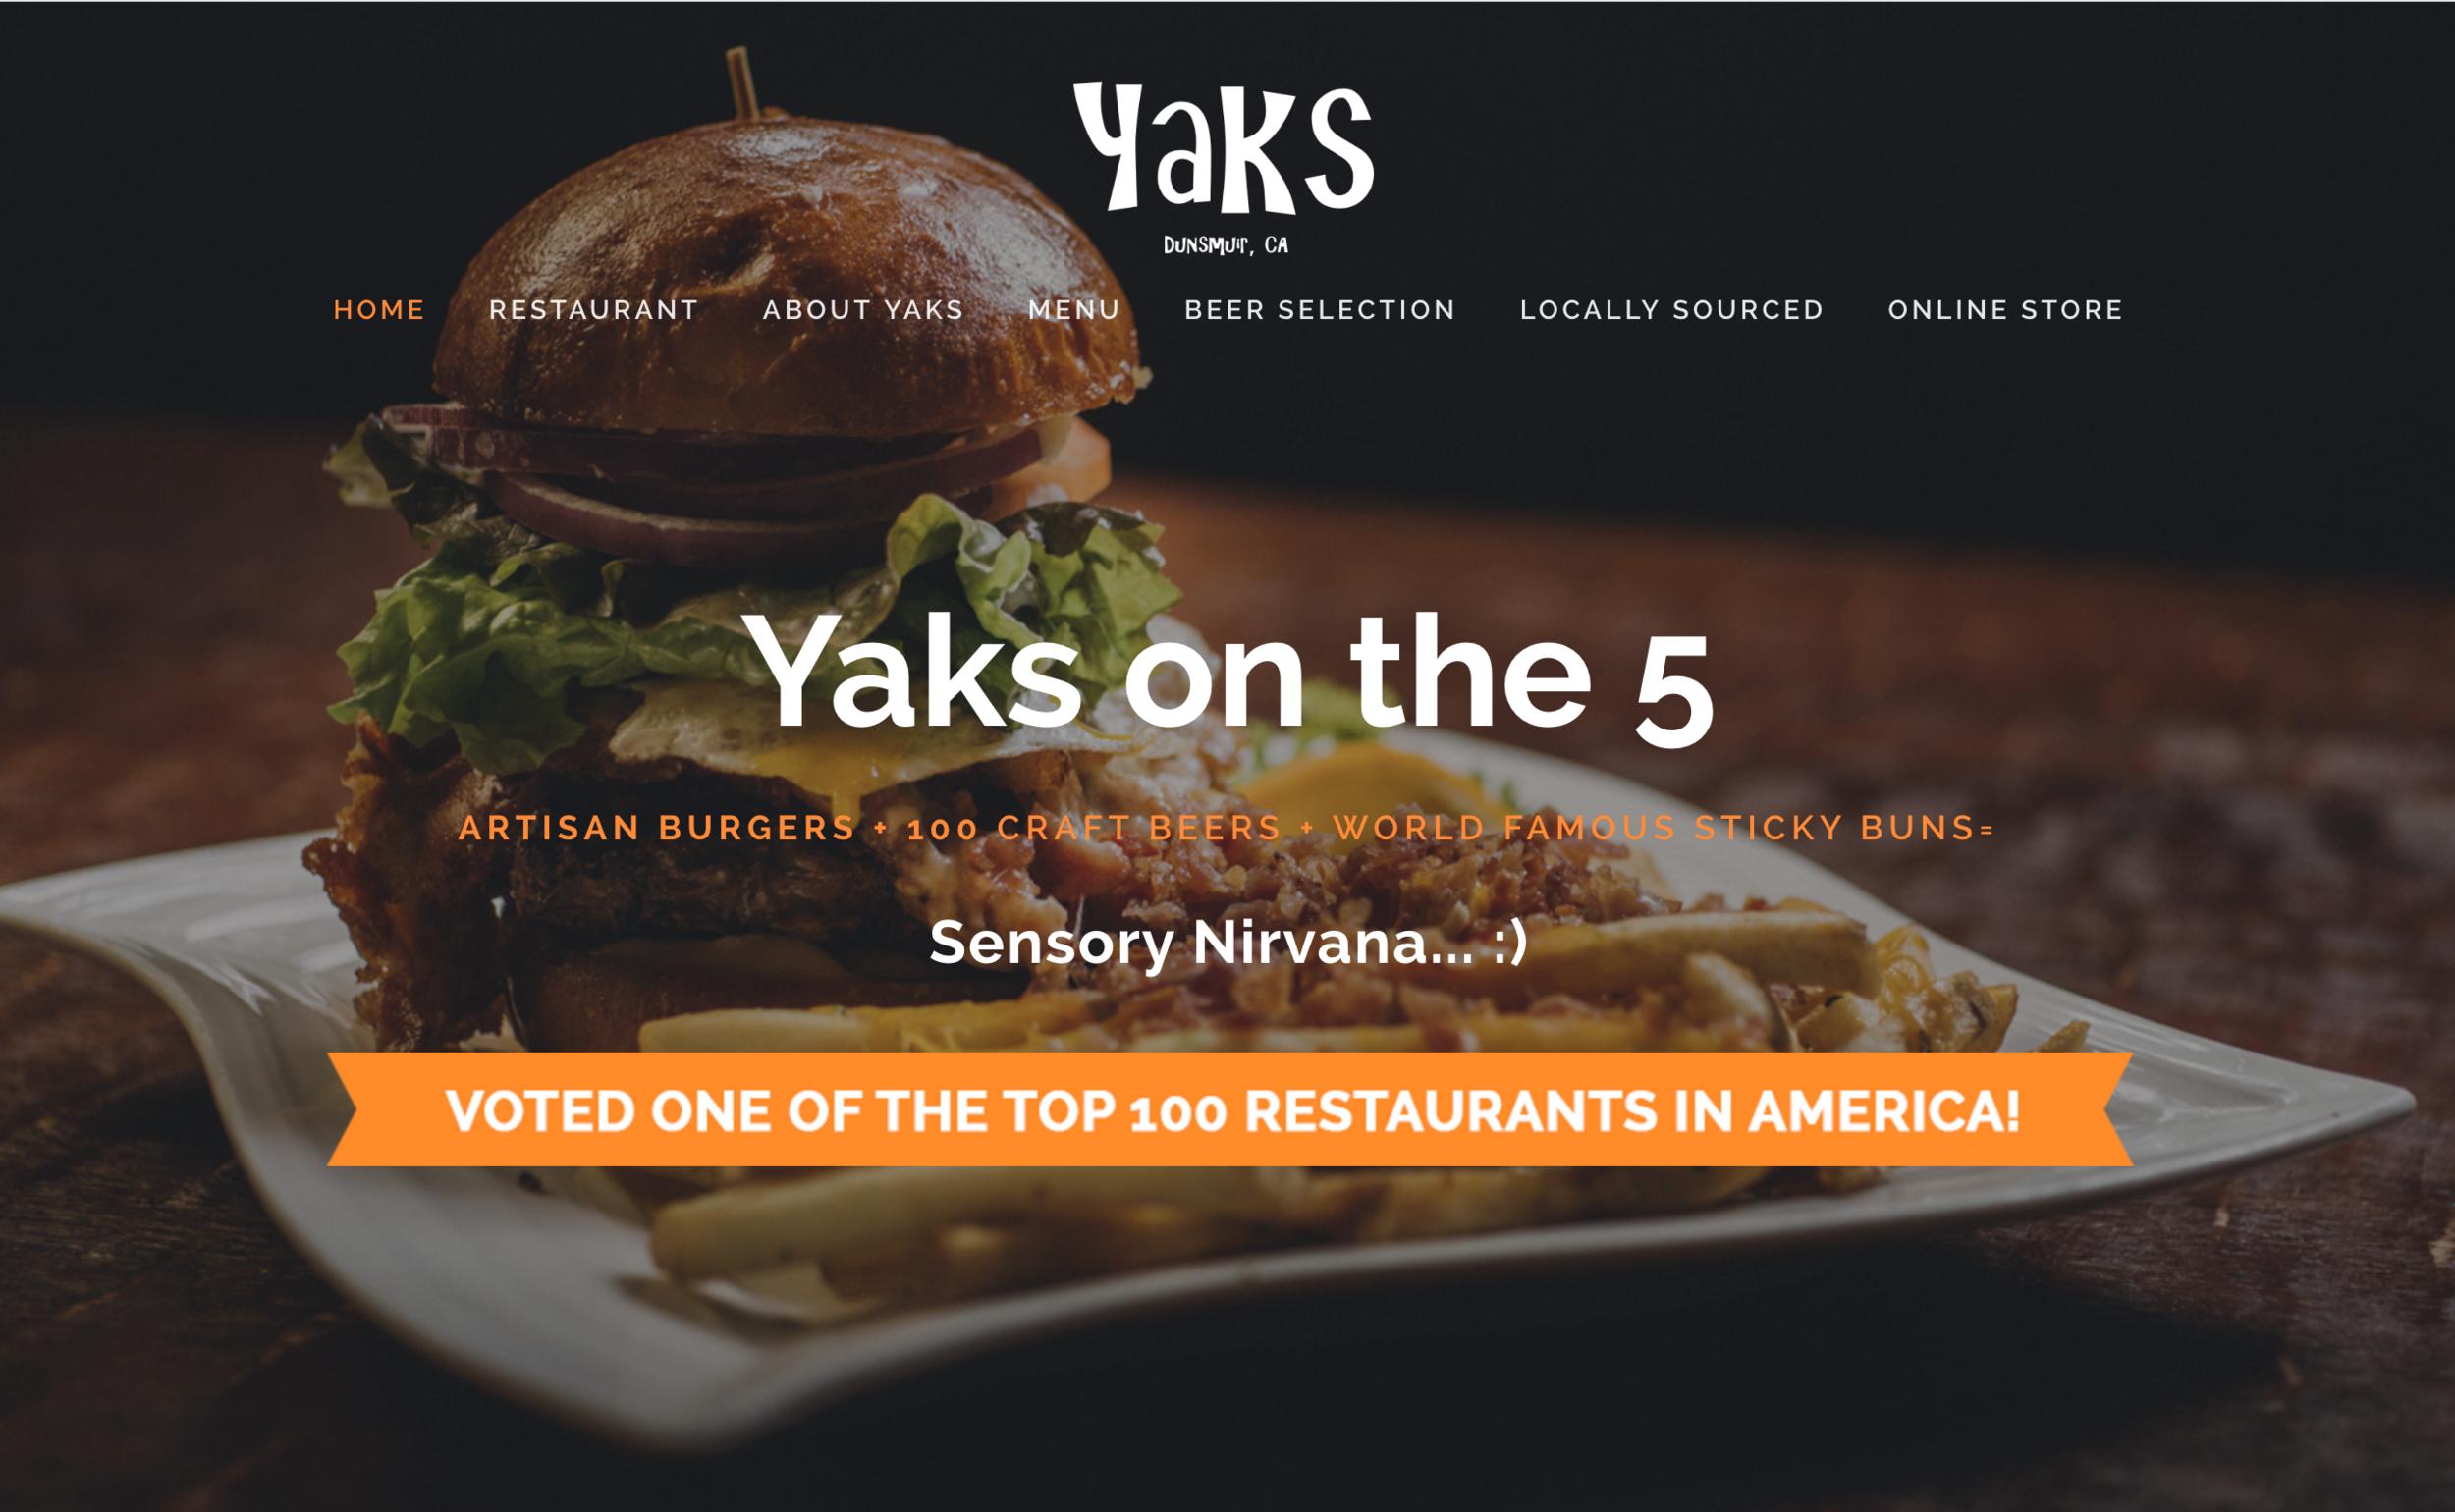 Yaks homepage